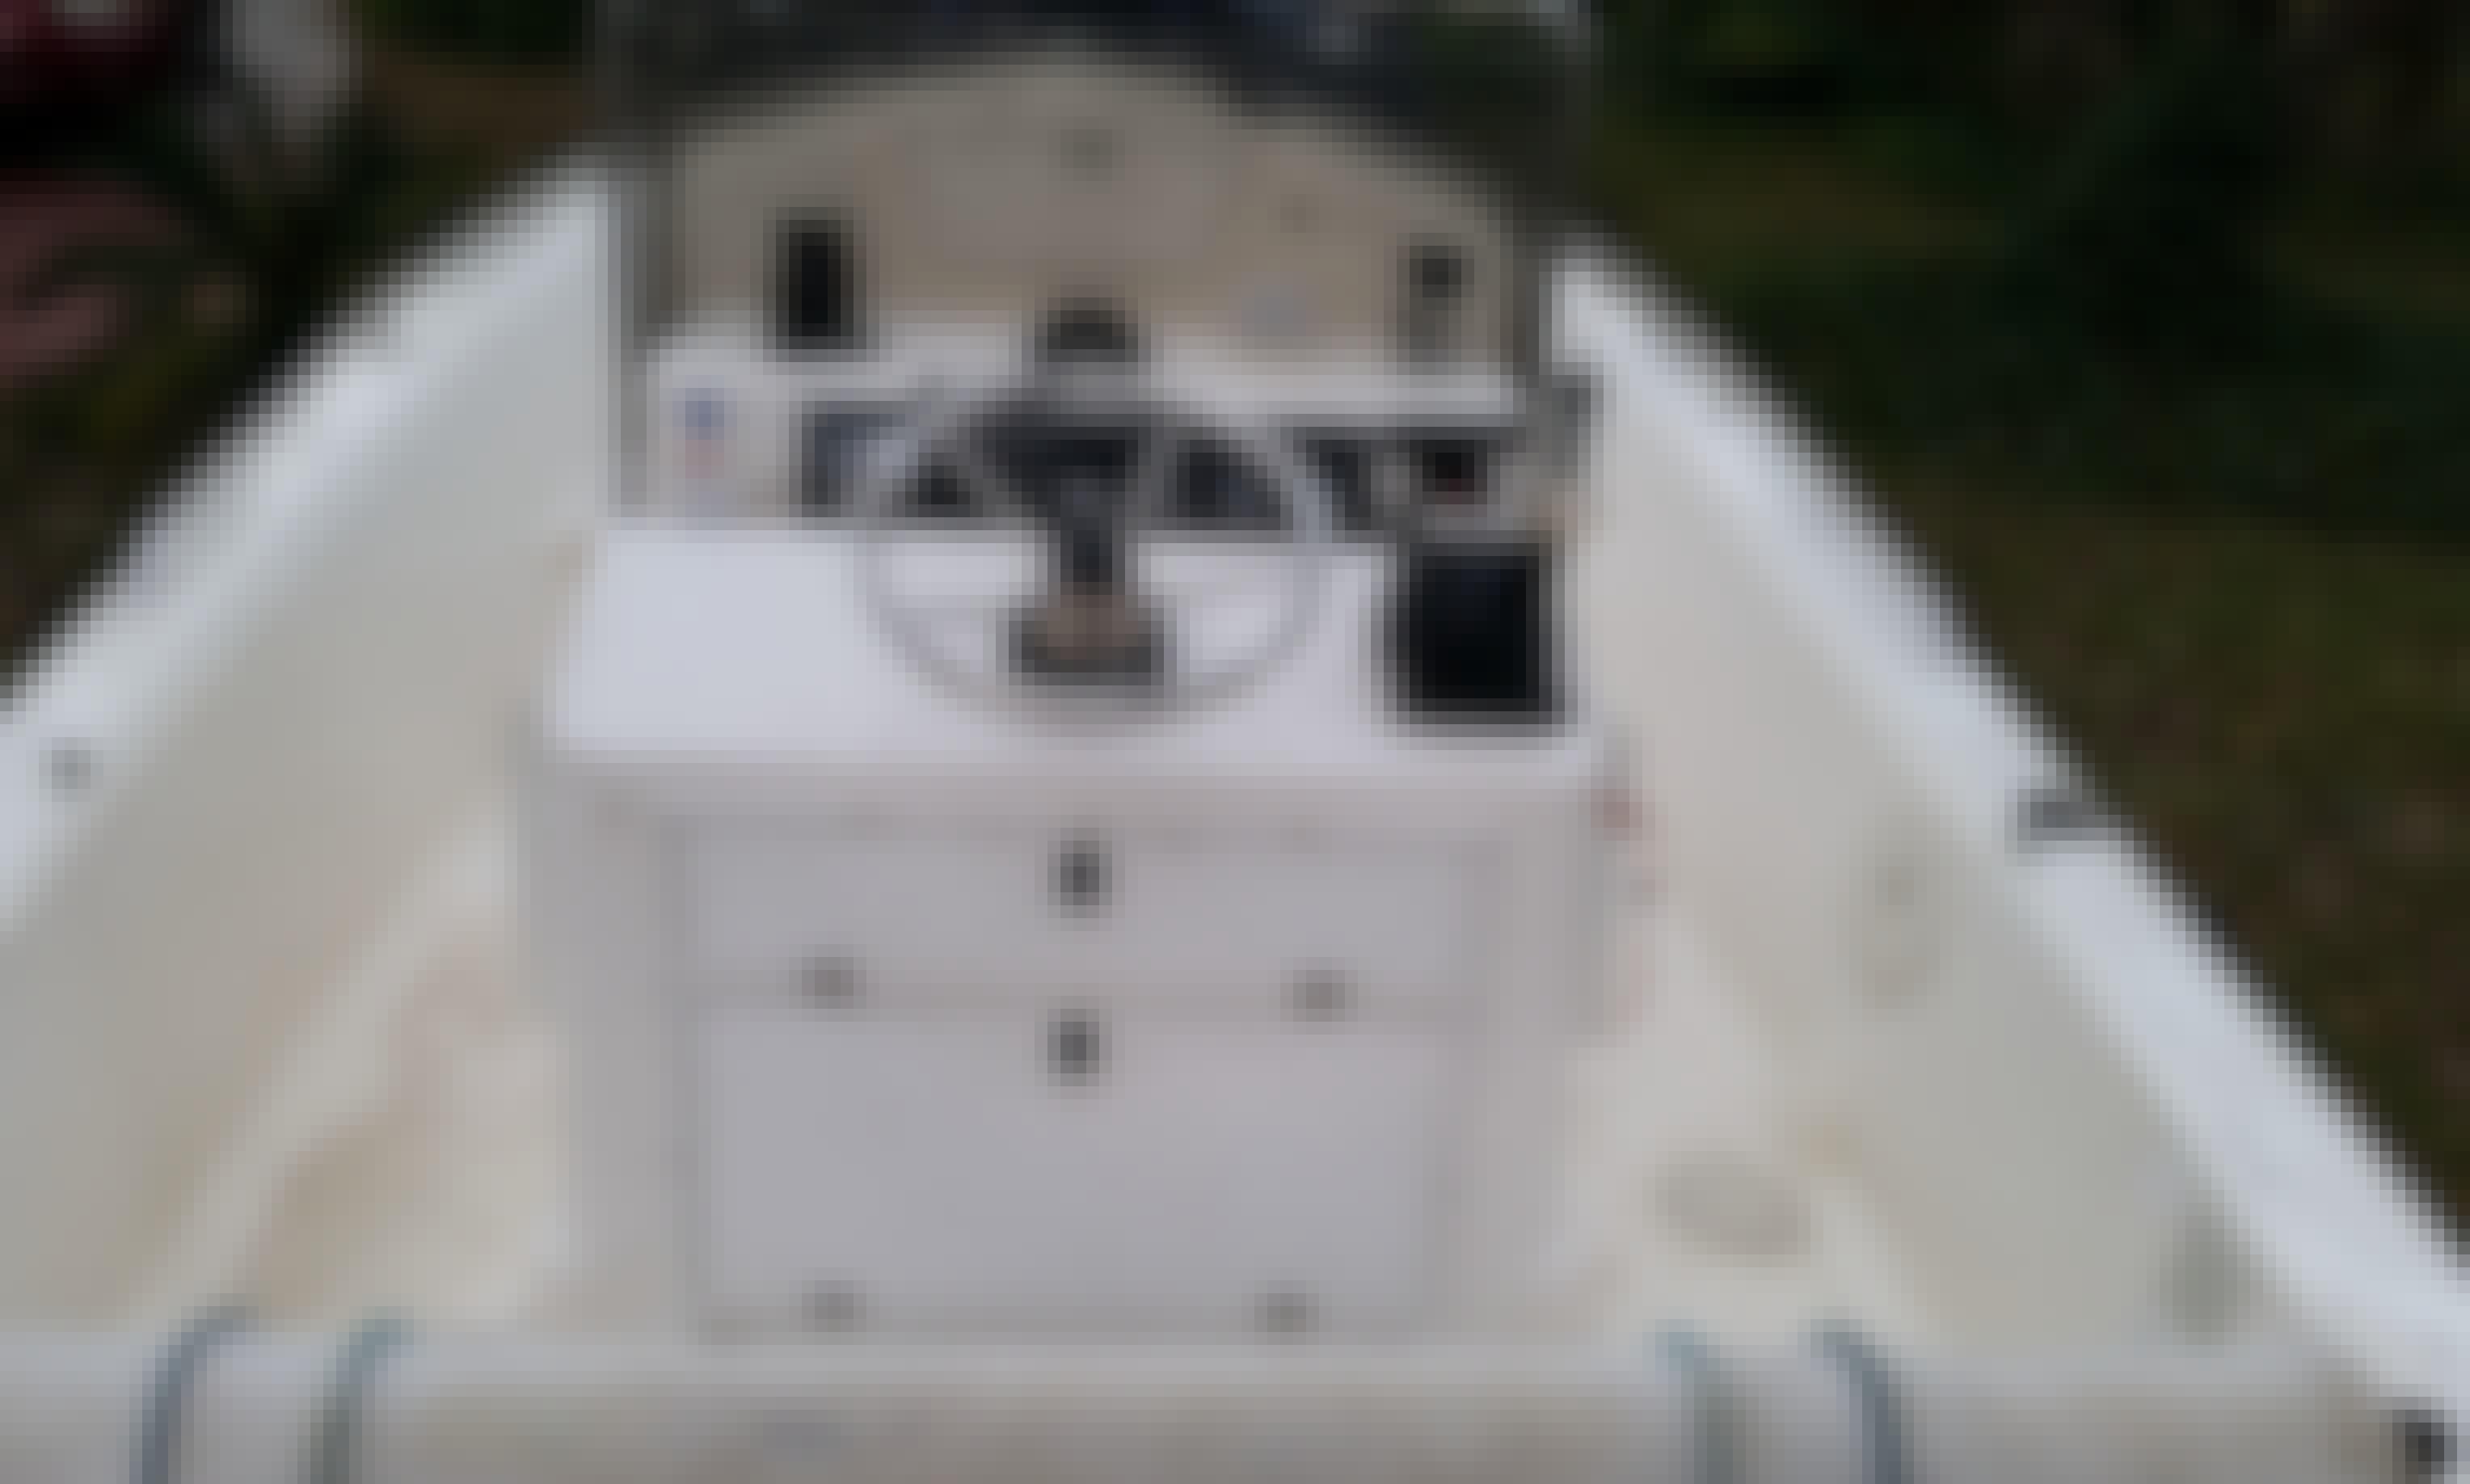 Aquasport Osprey 175 Center Console for Rent in Seville, Florida